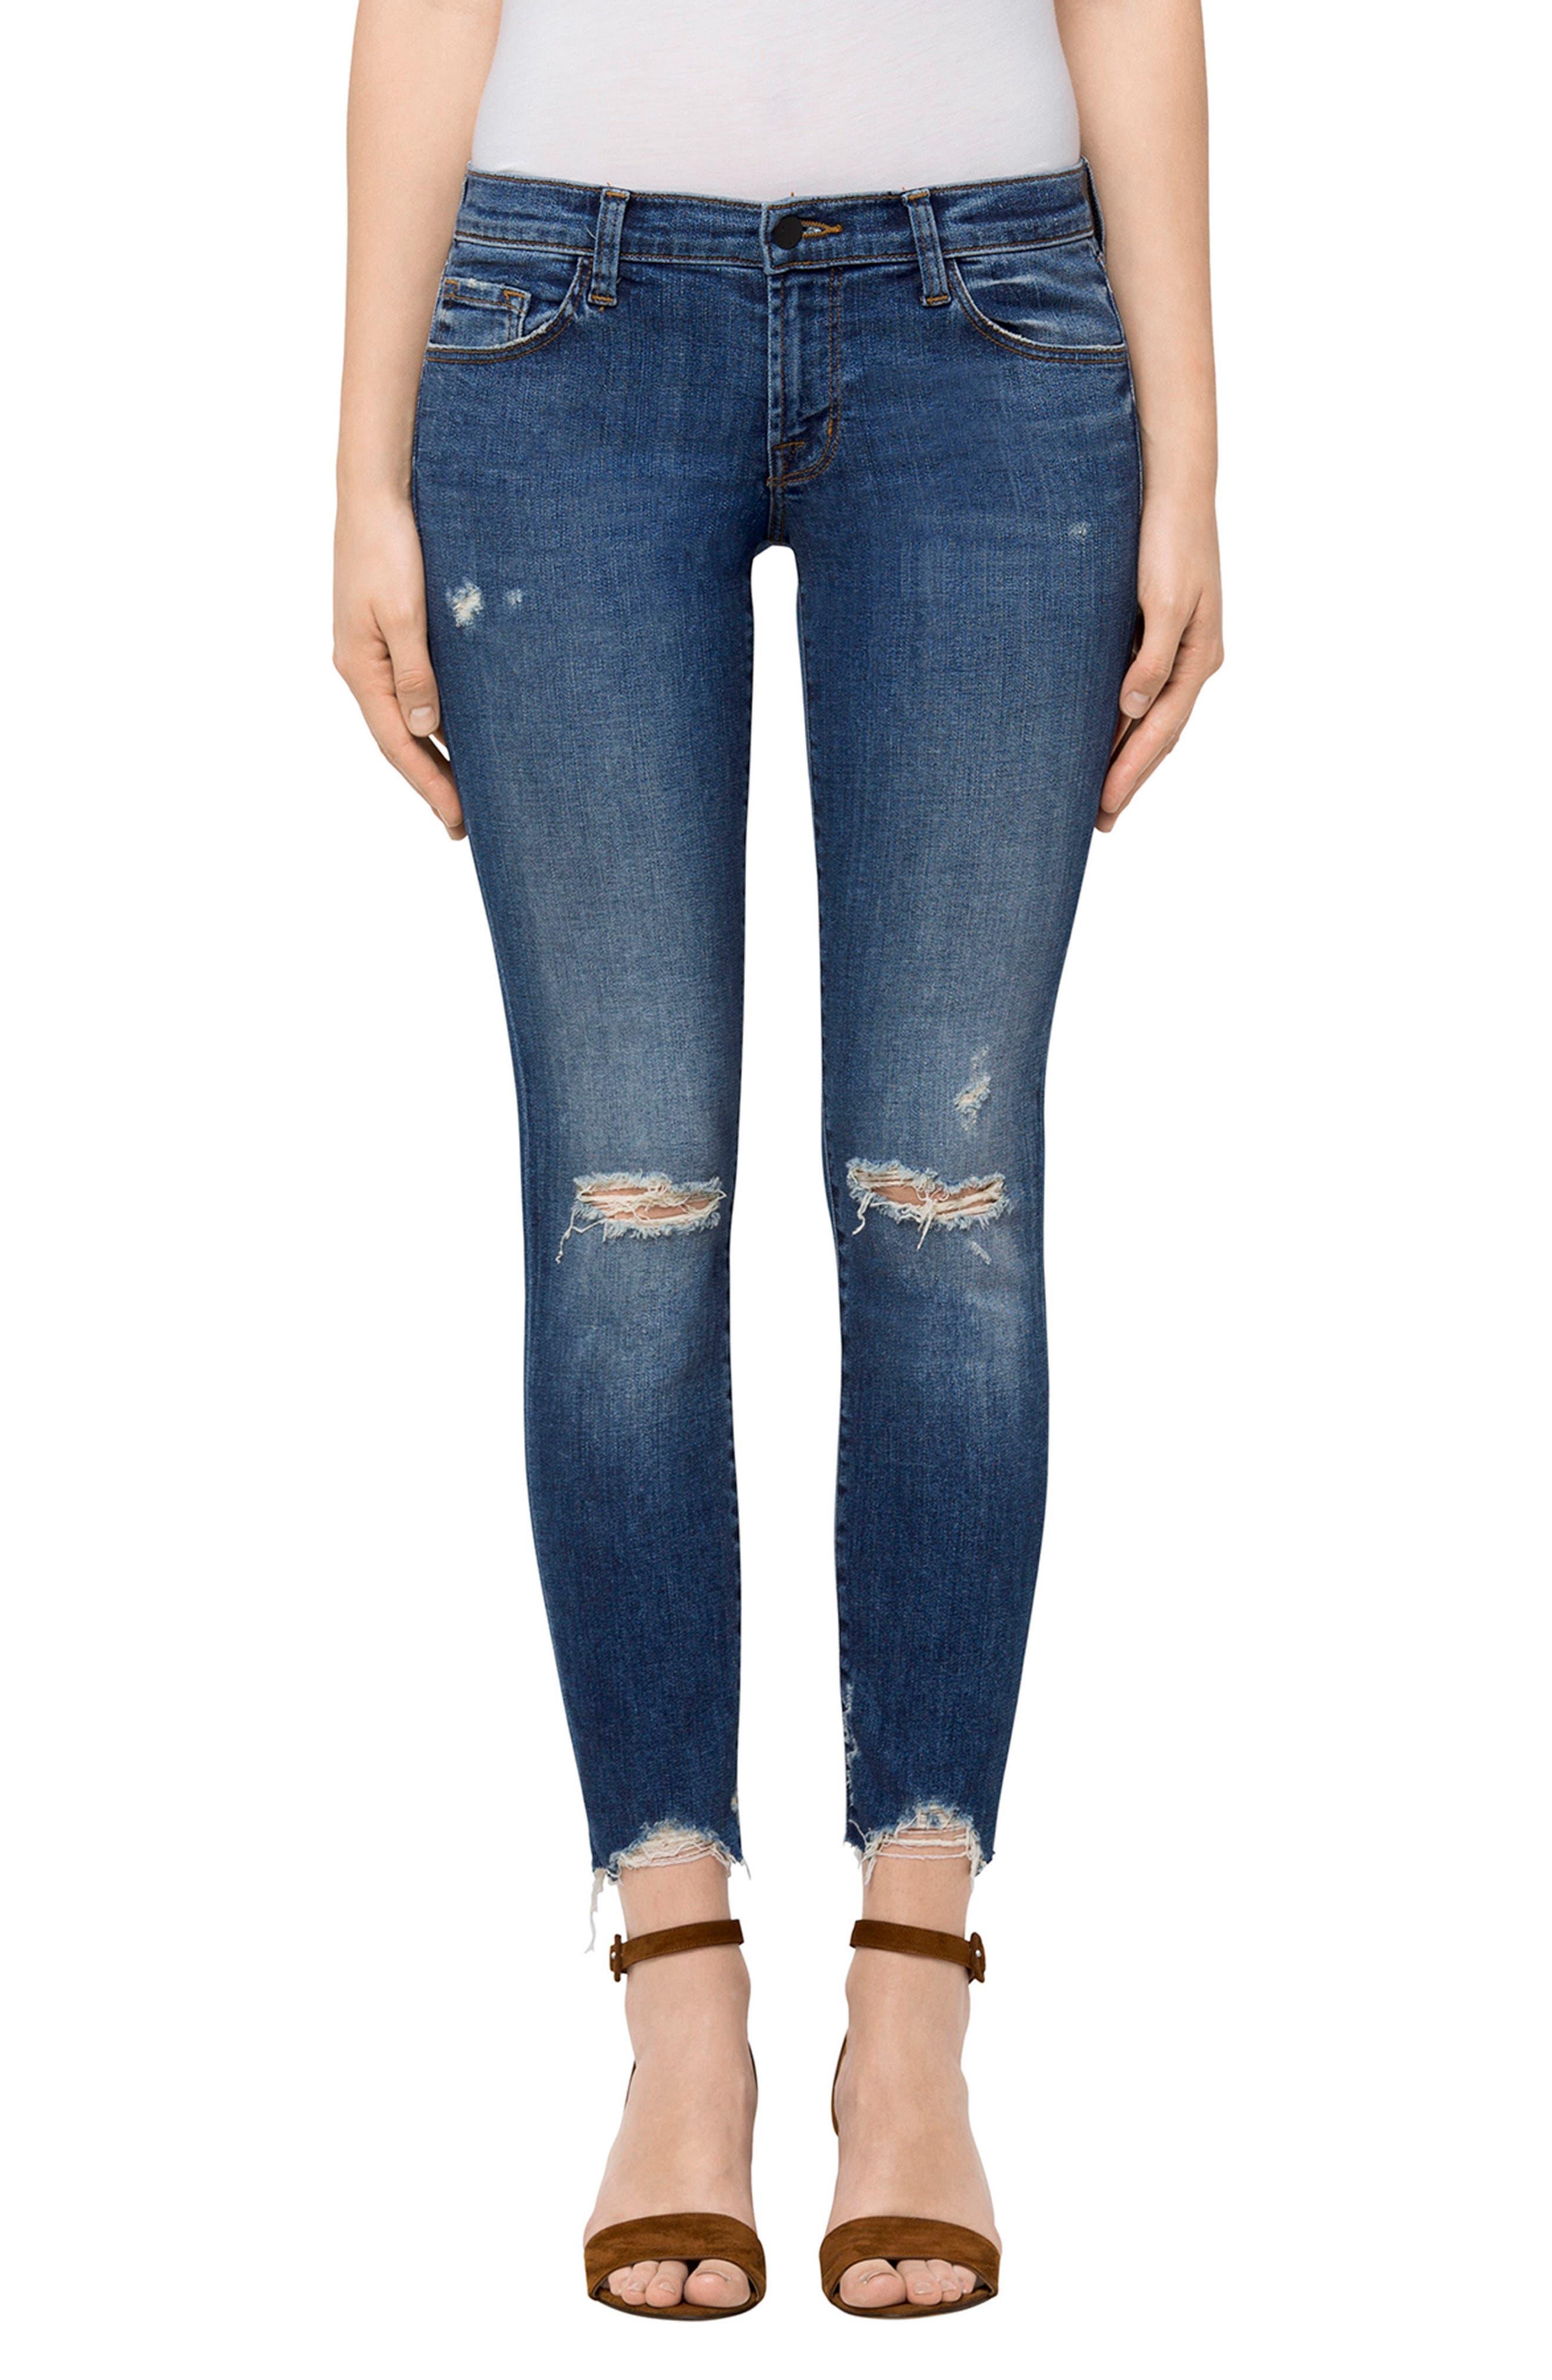 Main Image - J Brand 9326 Low Rise Crop Skinny Jeans (Revoke Destruct)